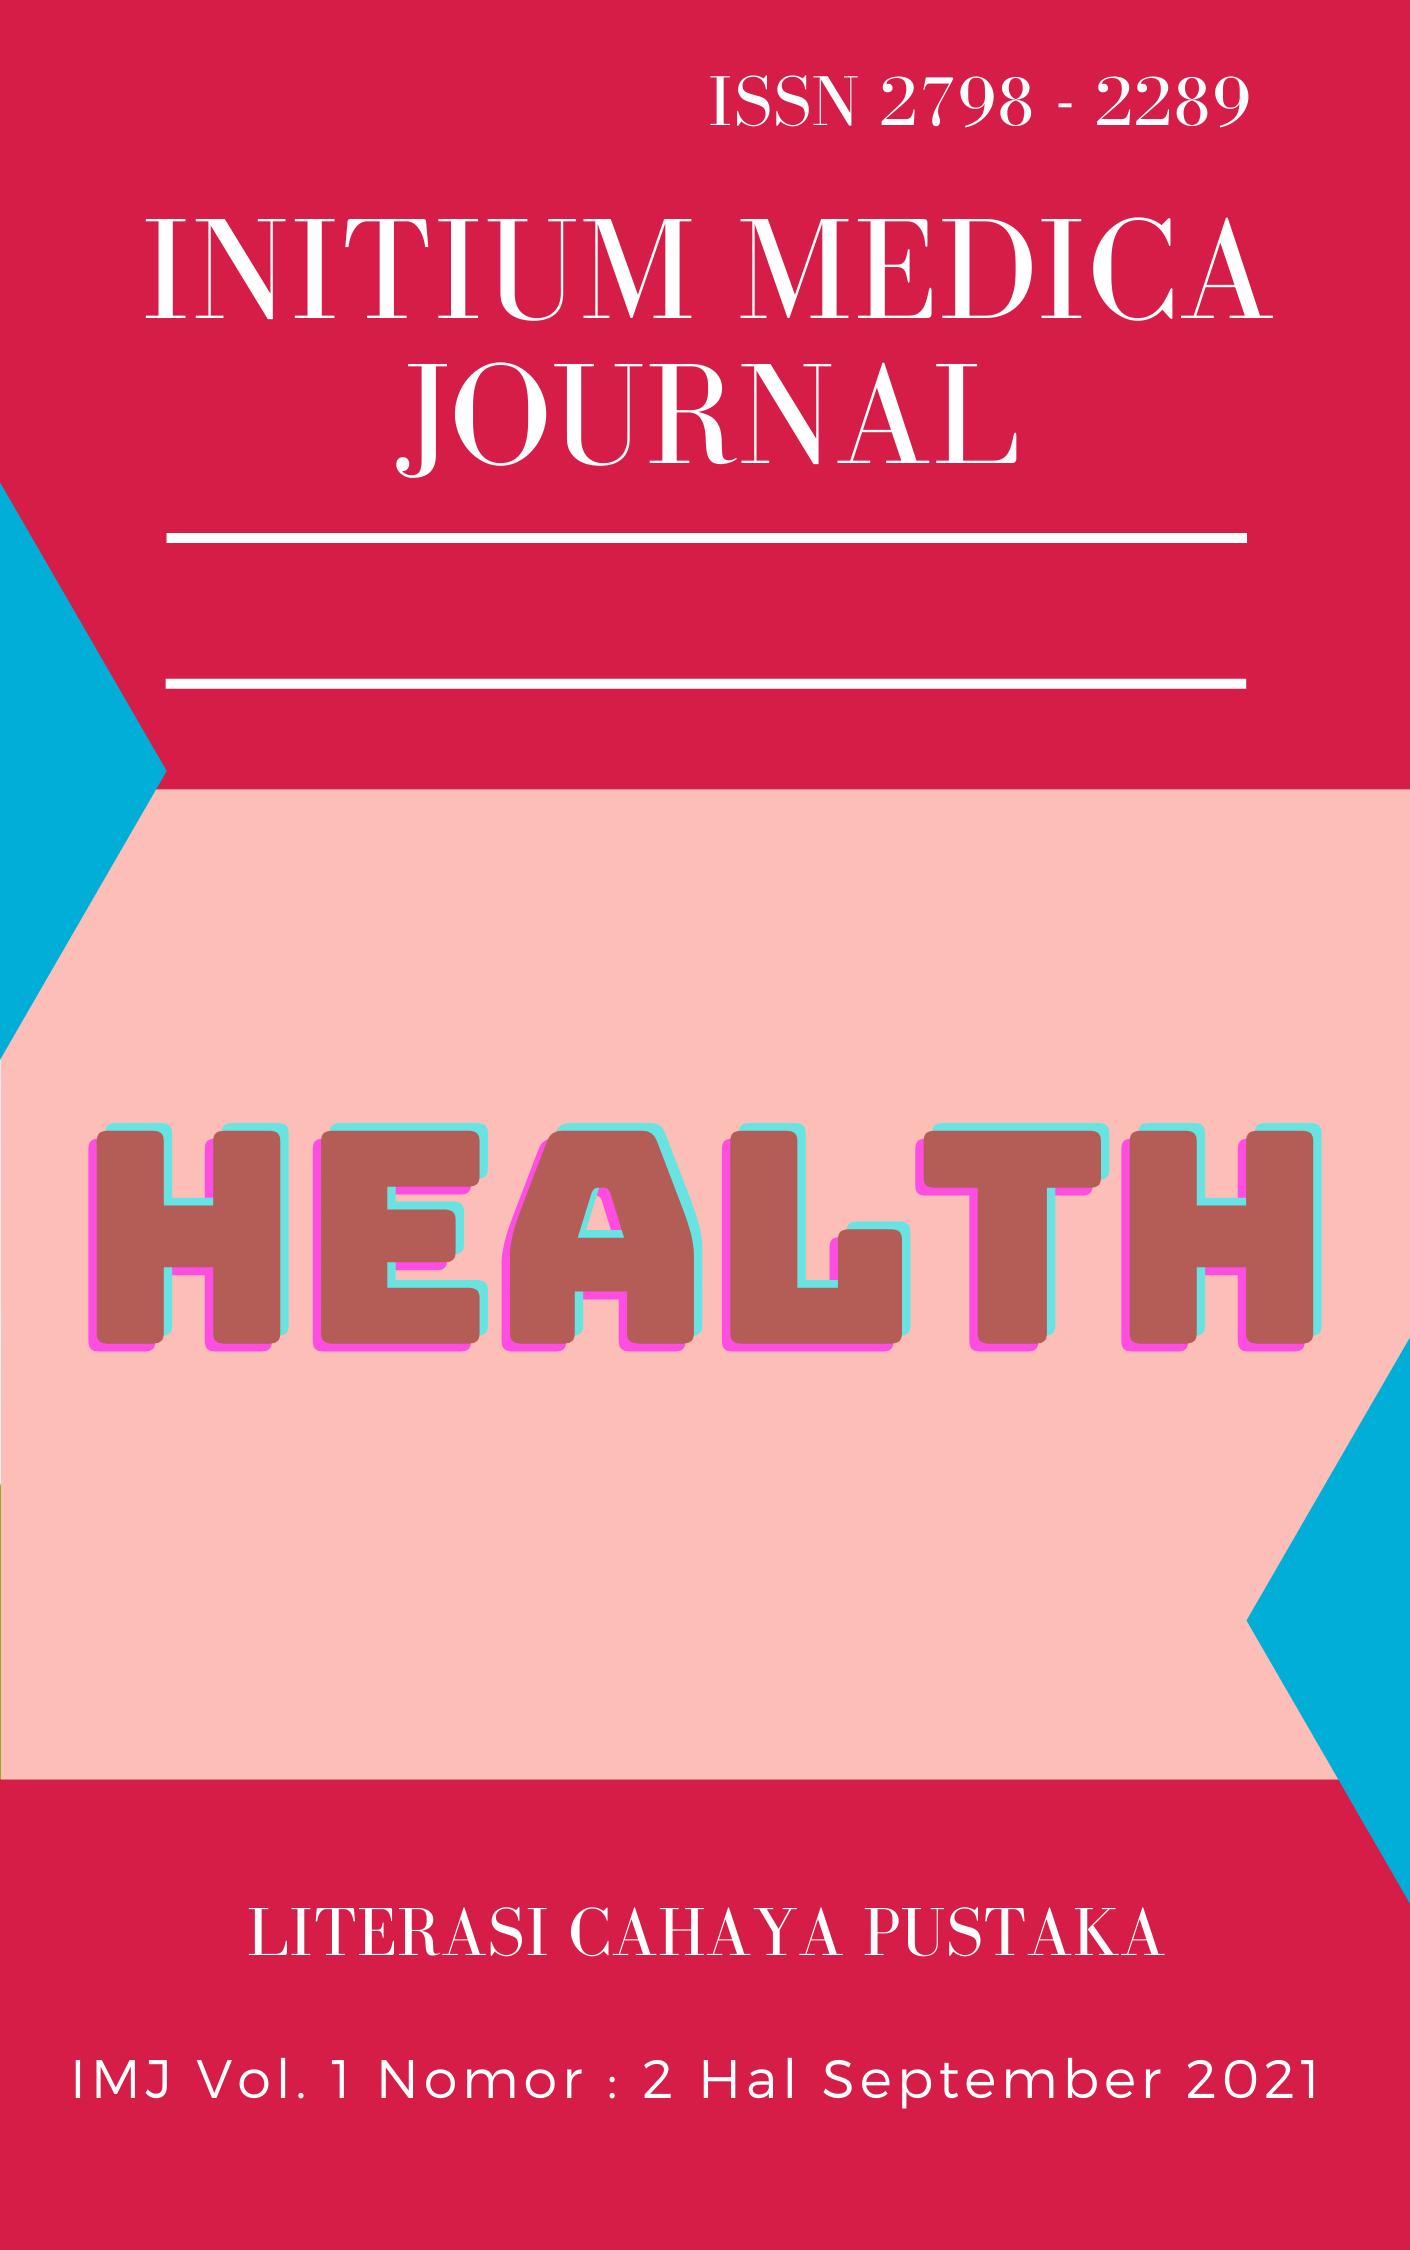 View Vol. 1 No. 2 (2021): Initium Medica Journal September 2021